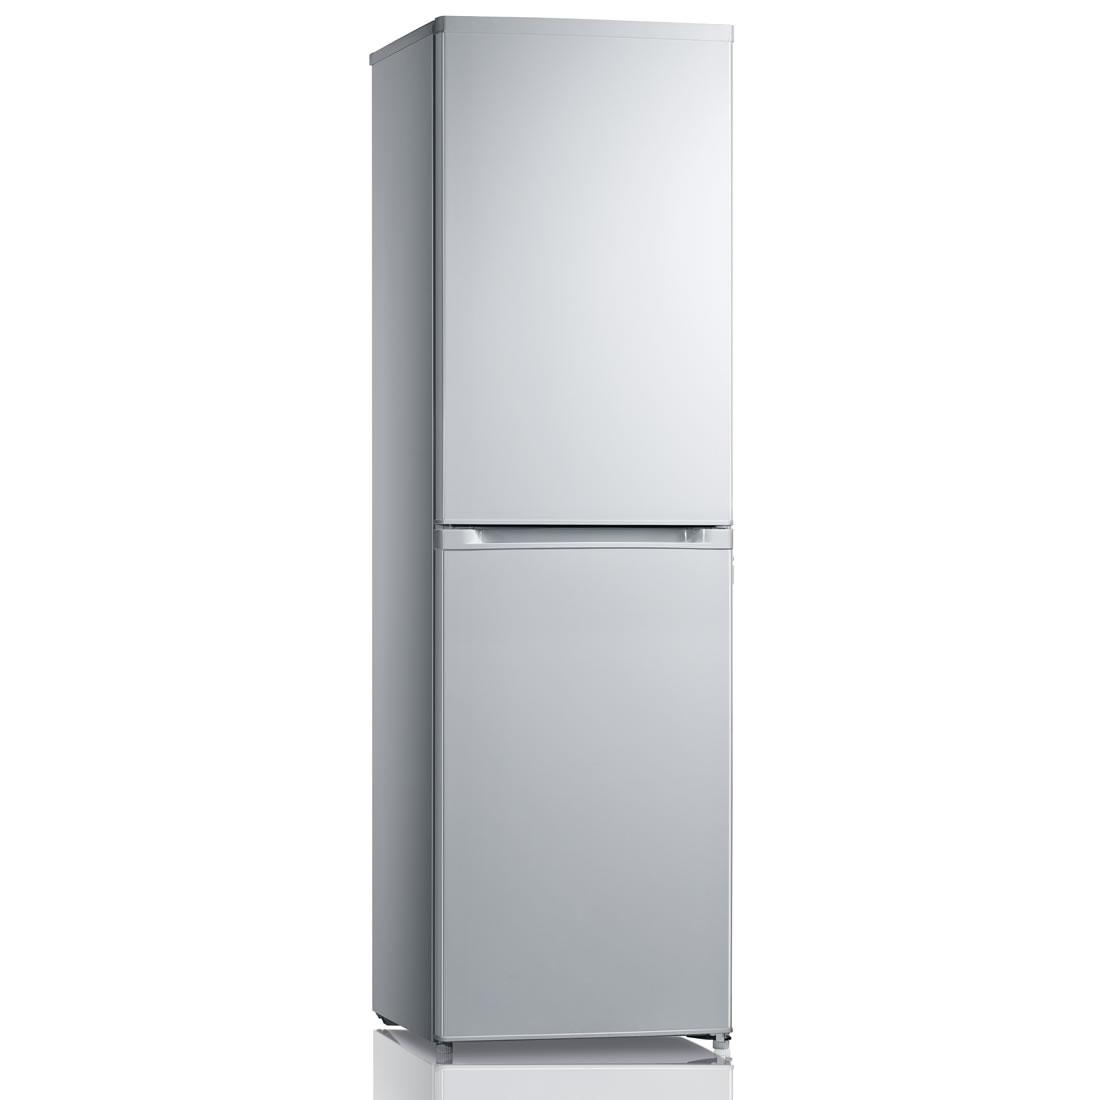 MFF196W 275litre Fridge Freezer Frost Free Class A+ White